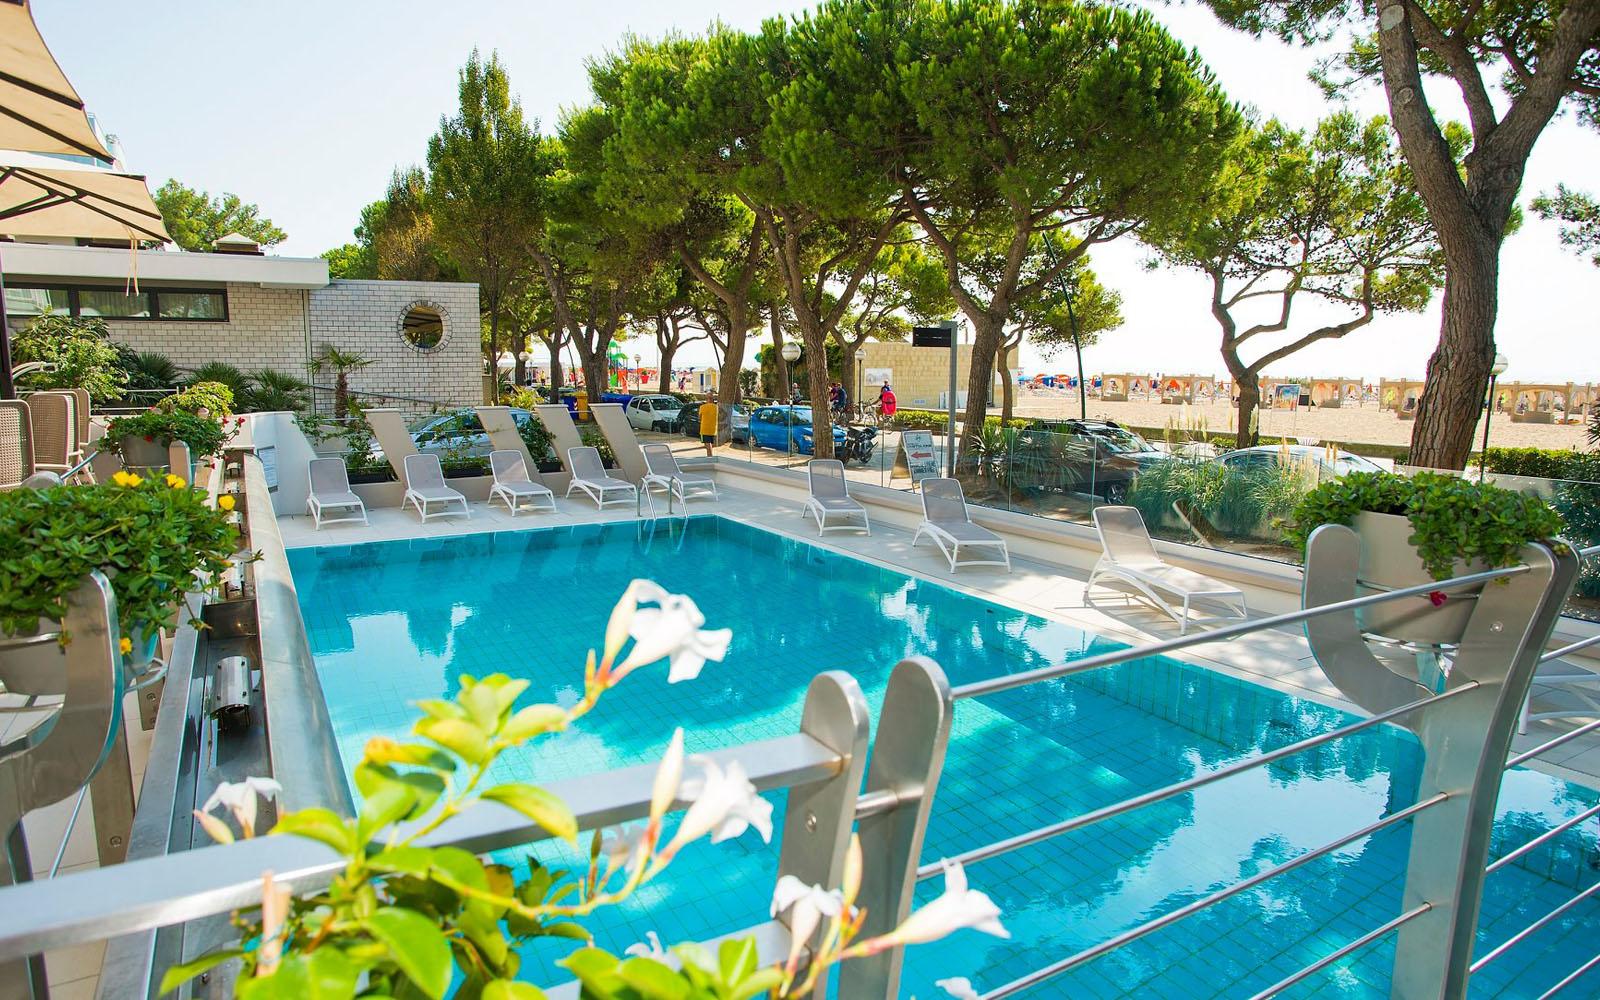 La piscina del Grand Hotel Playa a Lignano.